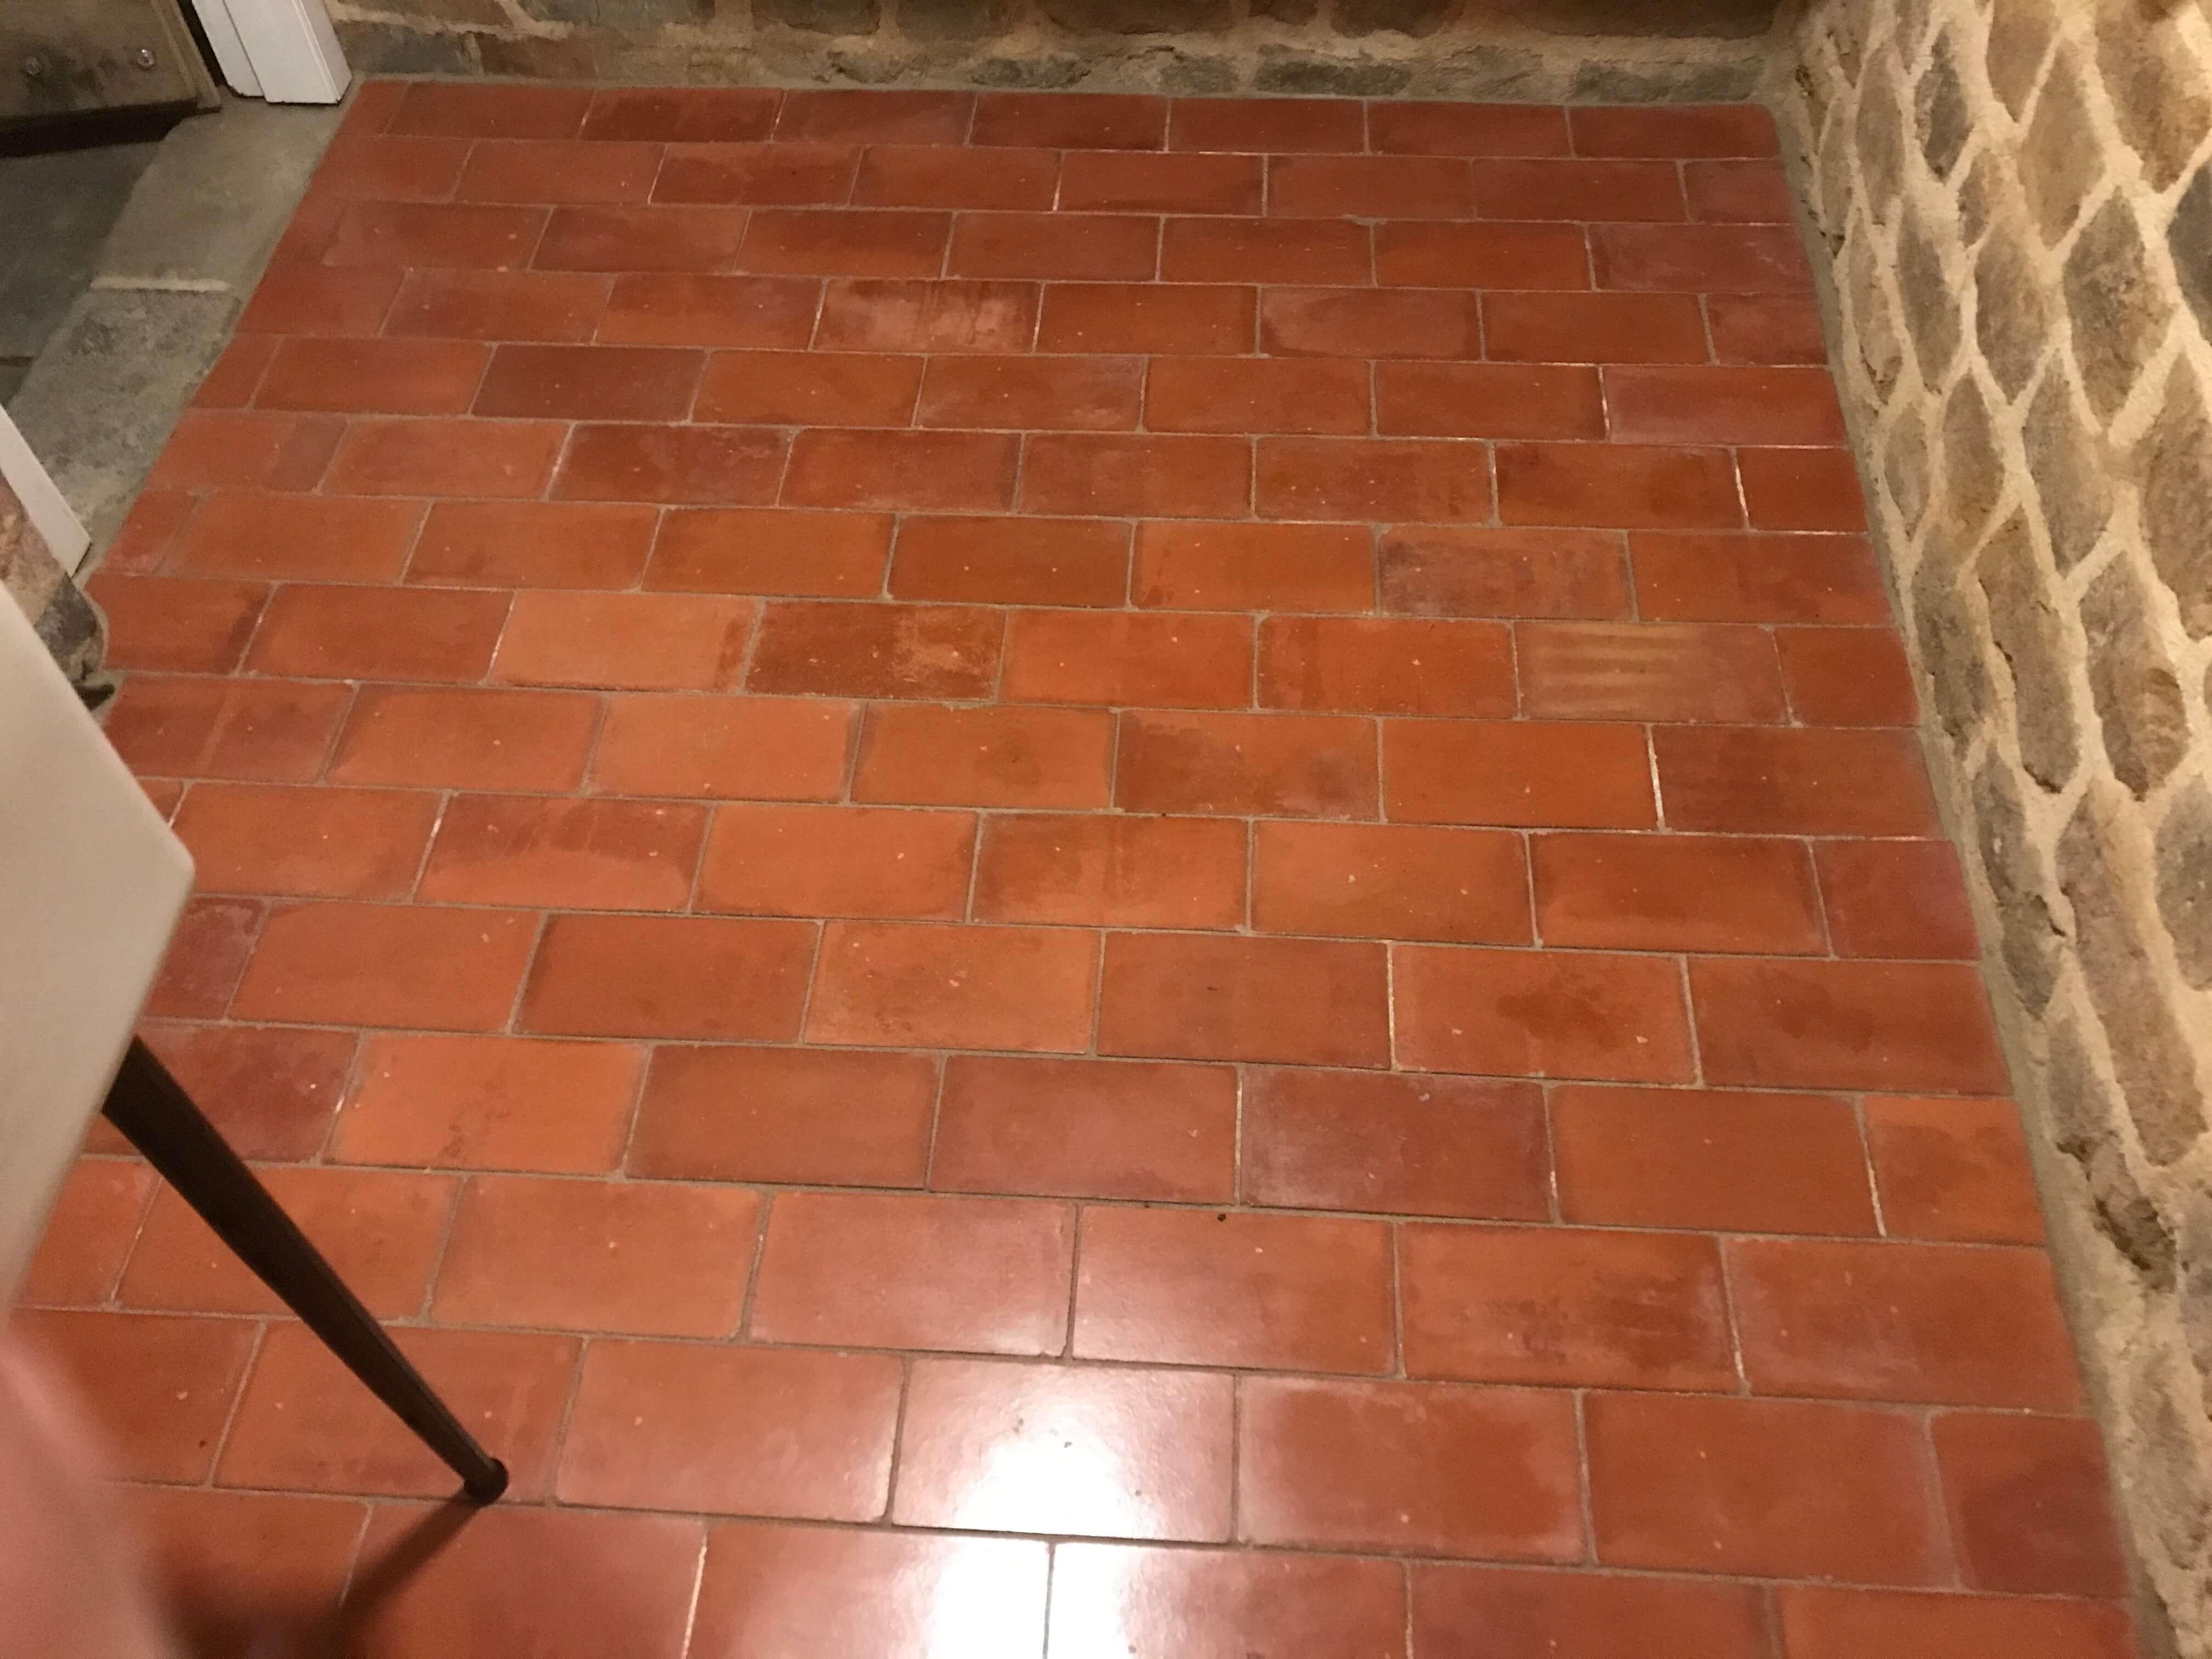 Reclaimed 9 X 4 5 Inch Terracotta Red Quarry Tiles